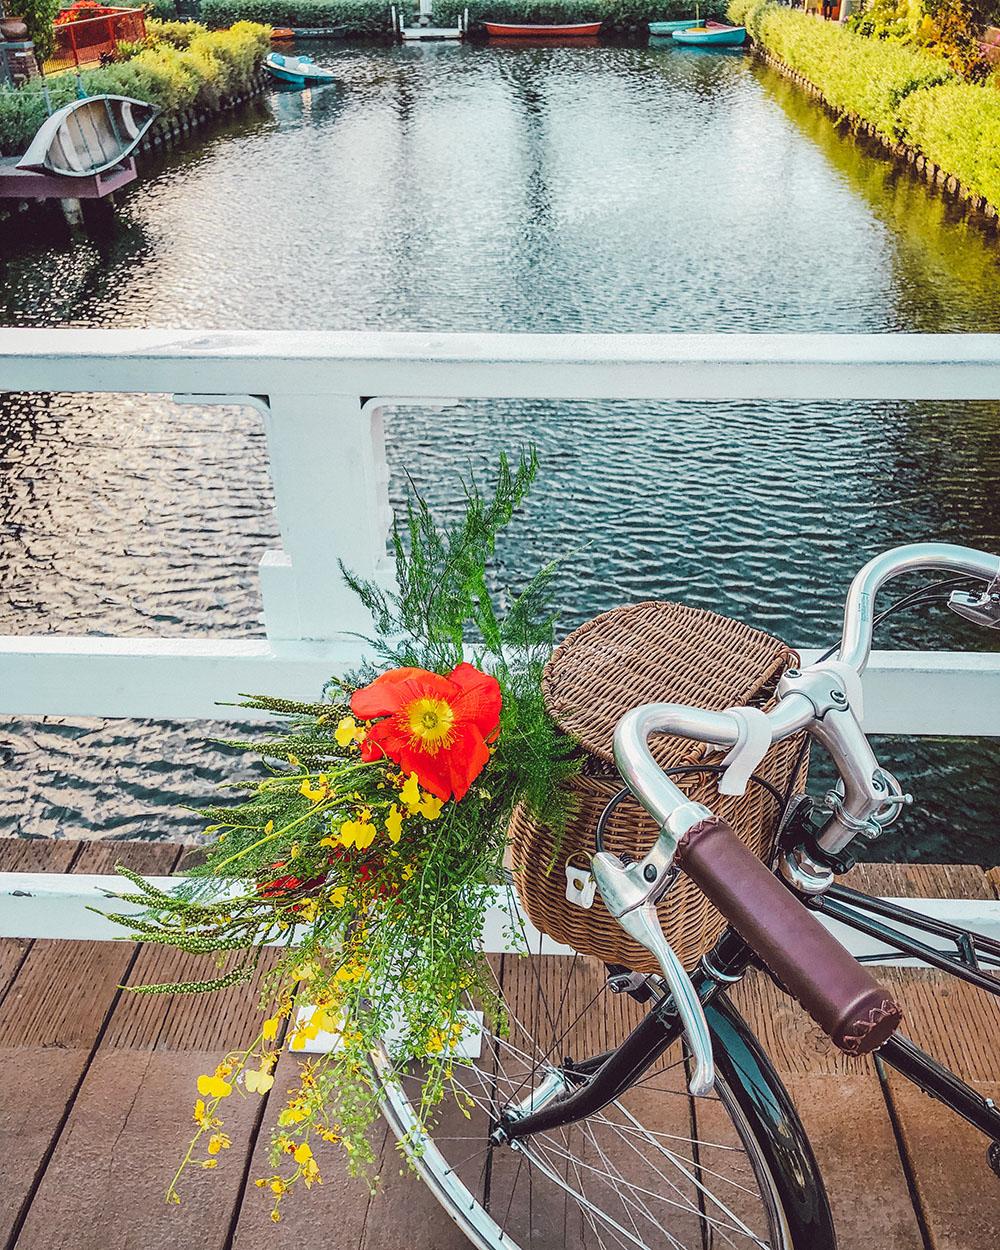 bike_canals.jpg